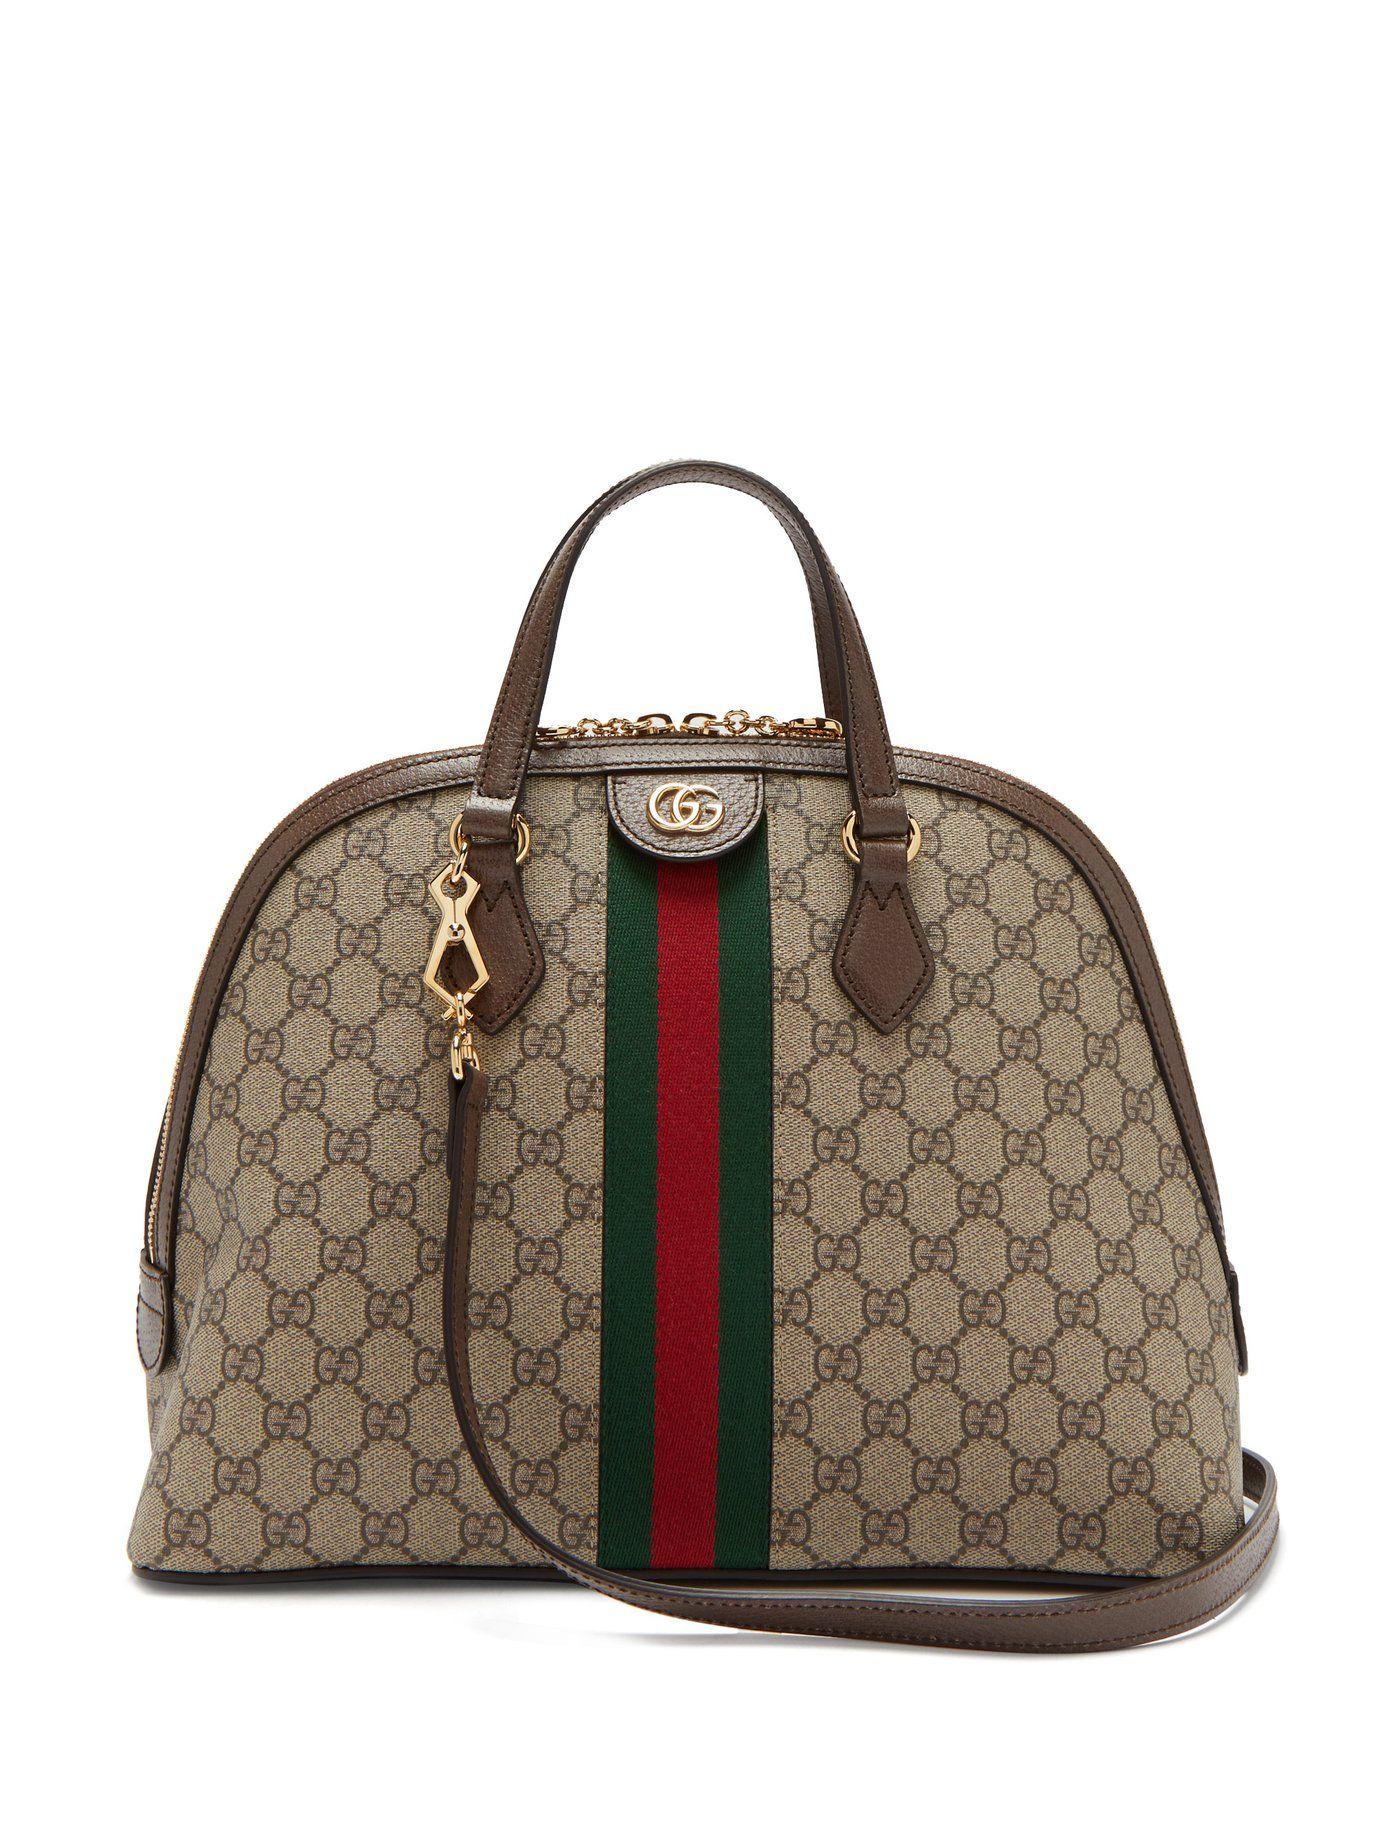 37501f67092804 Ophidia GG Supreme tote bag | Gucci | MATCHESFASHION.COM | BASIC ...